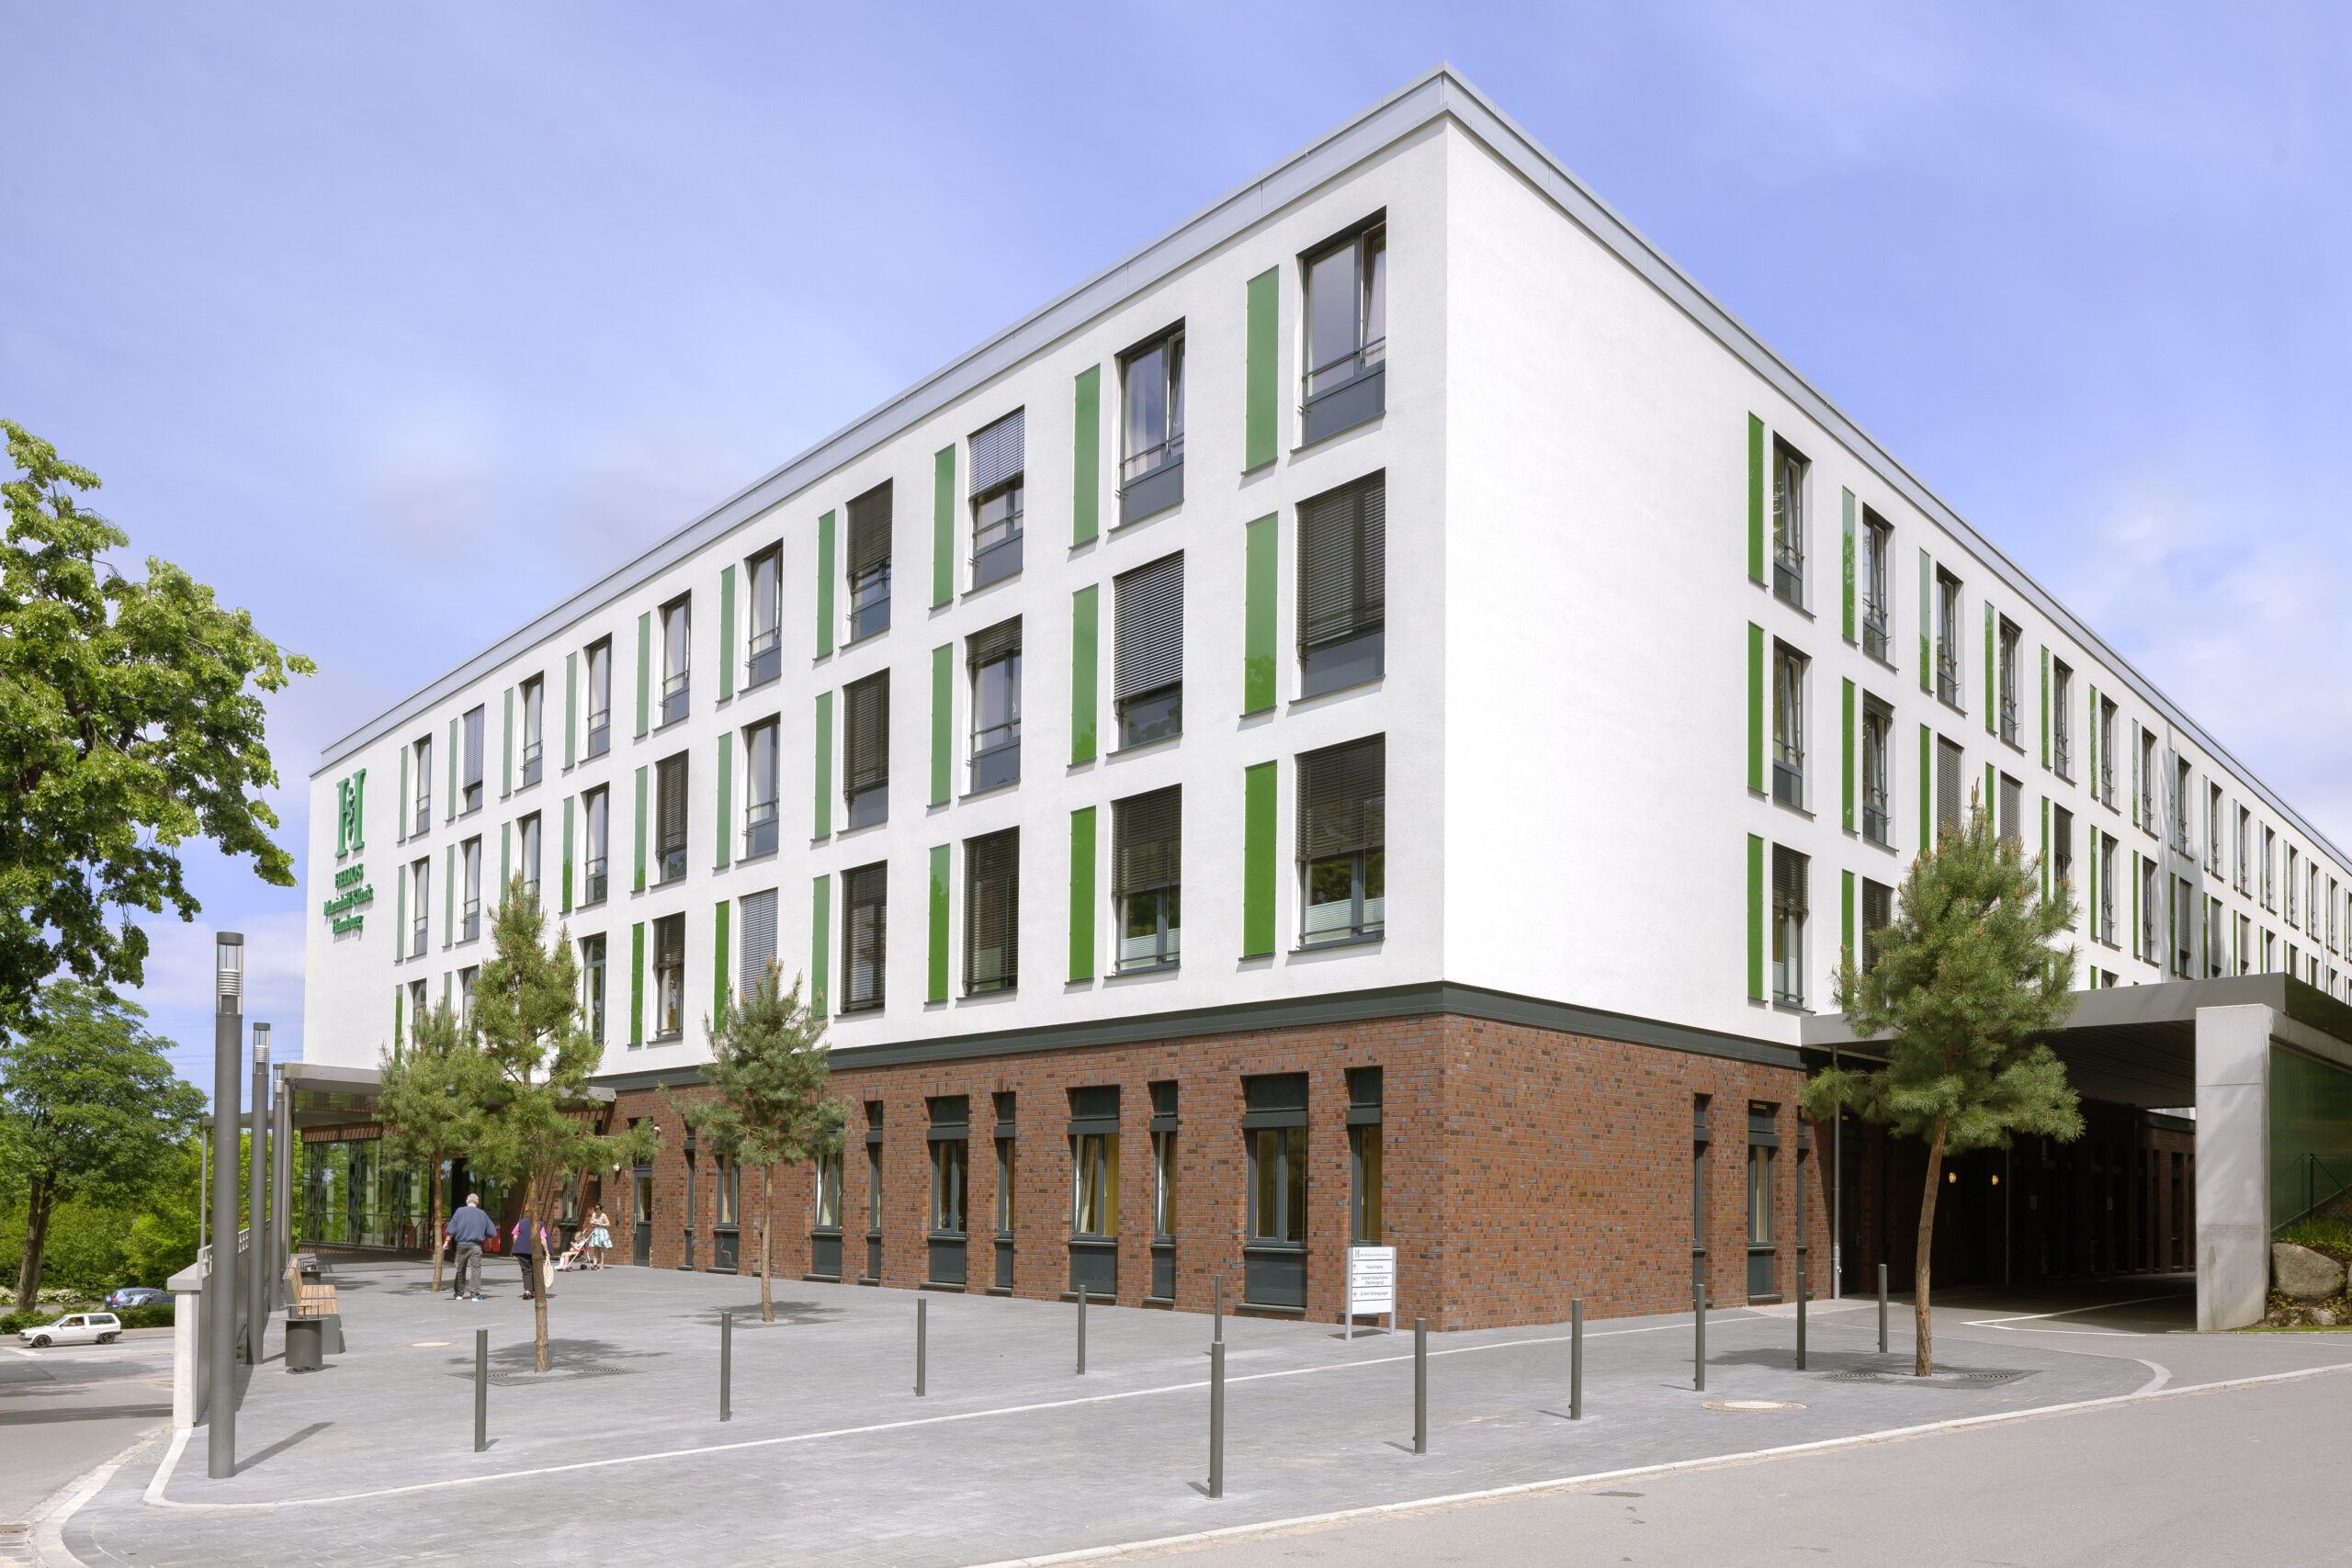 Helios Mariahilf Klinik, Duisburg